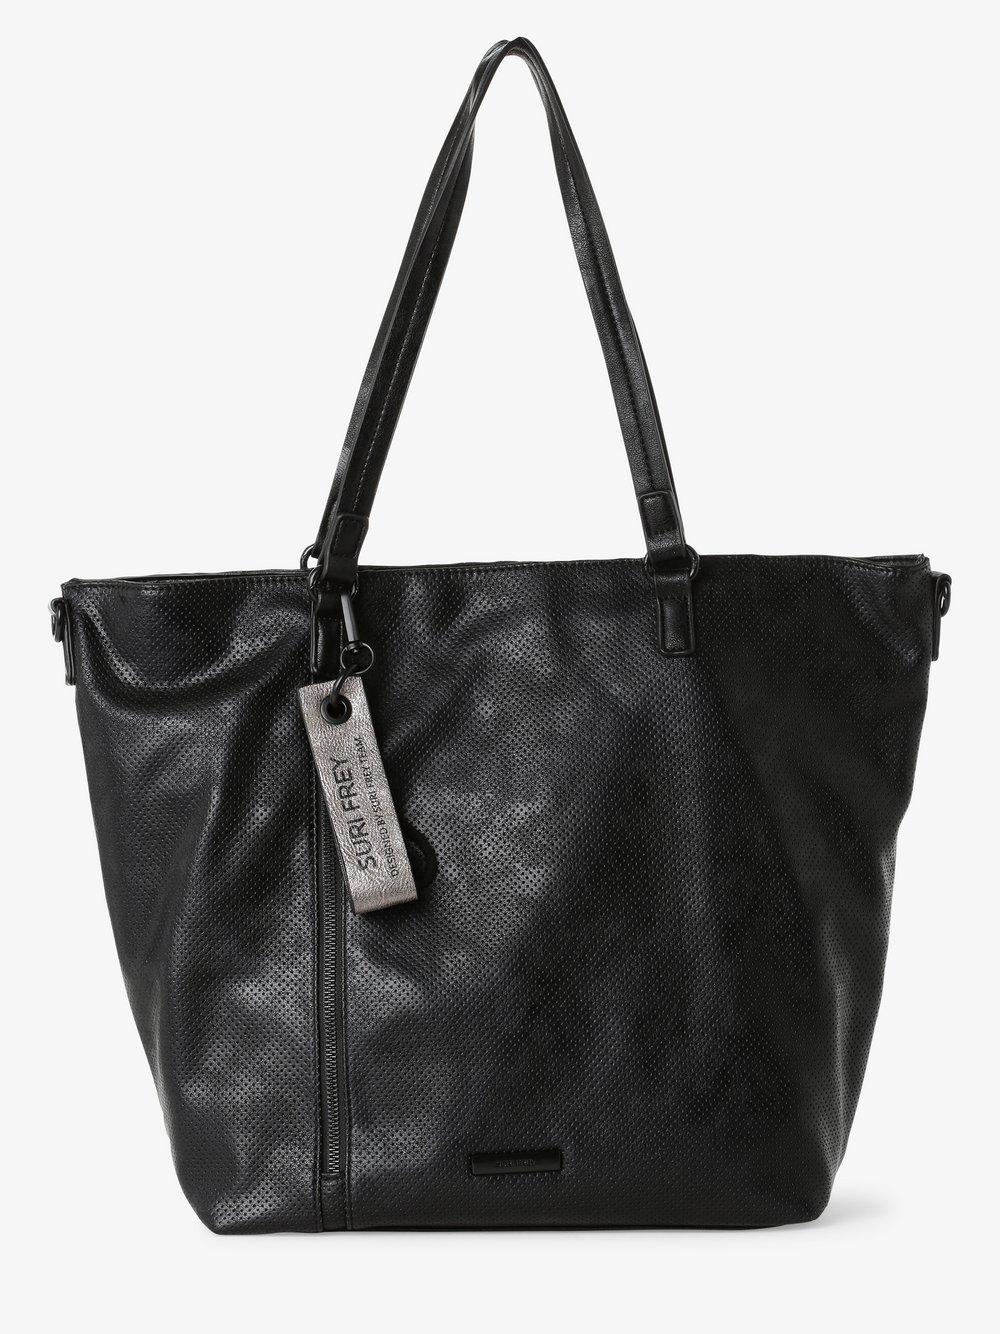 Suri Frey - Damska torba shopper – Fany, czarny